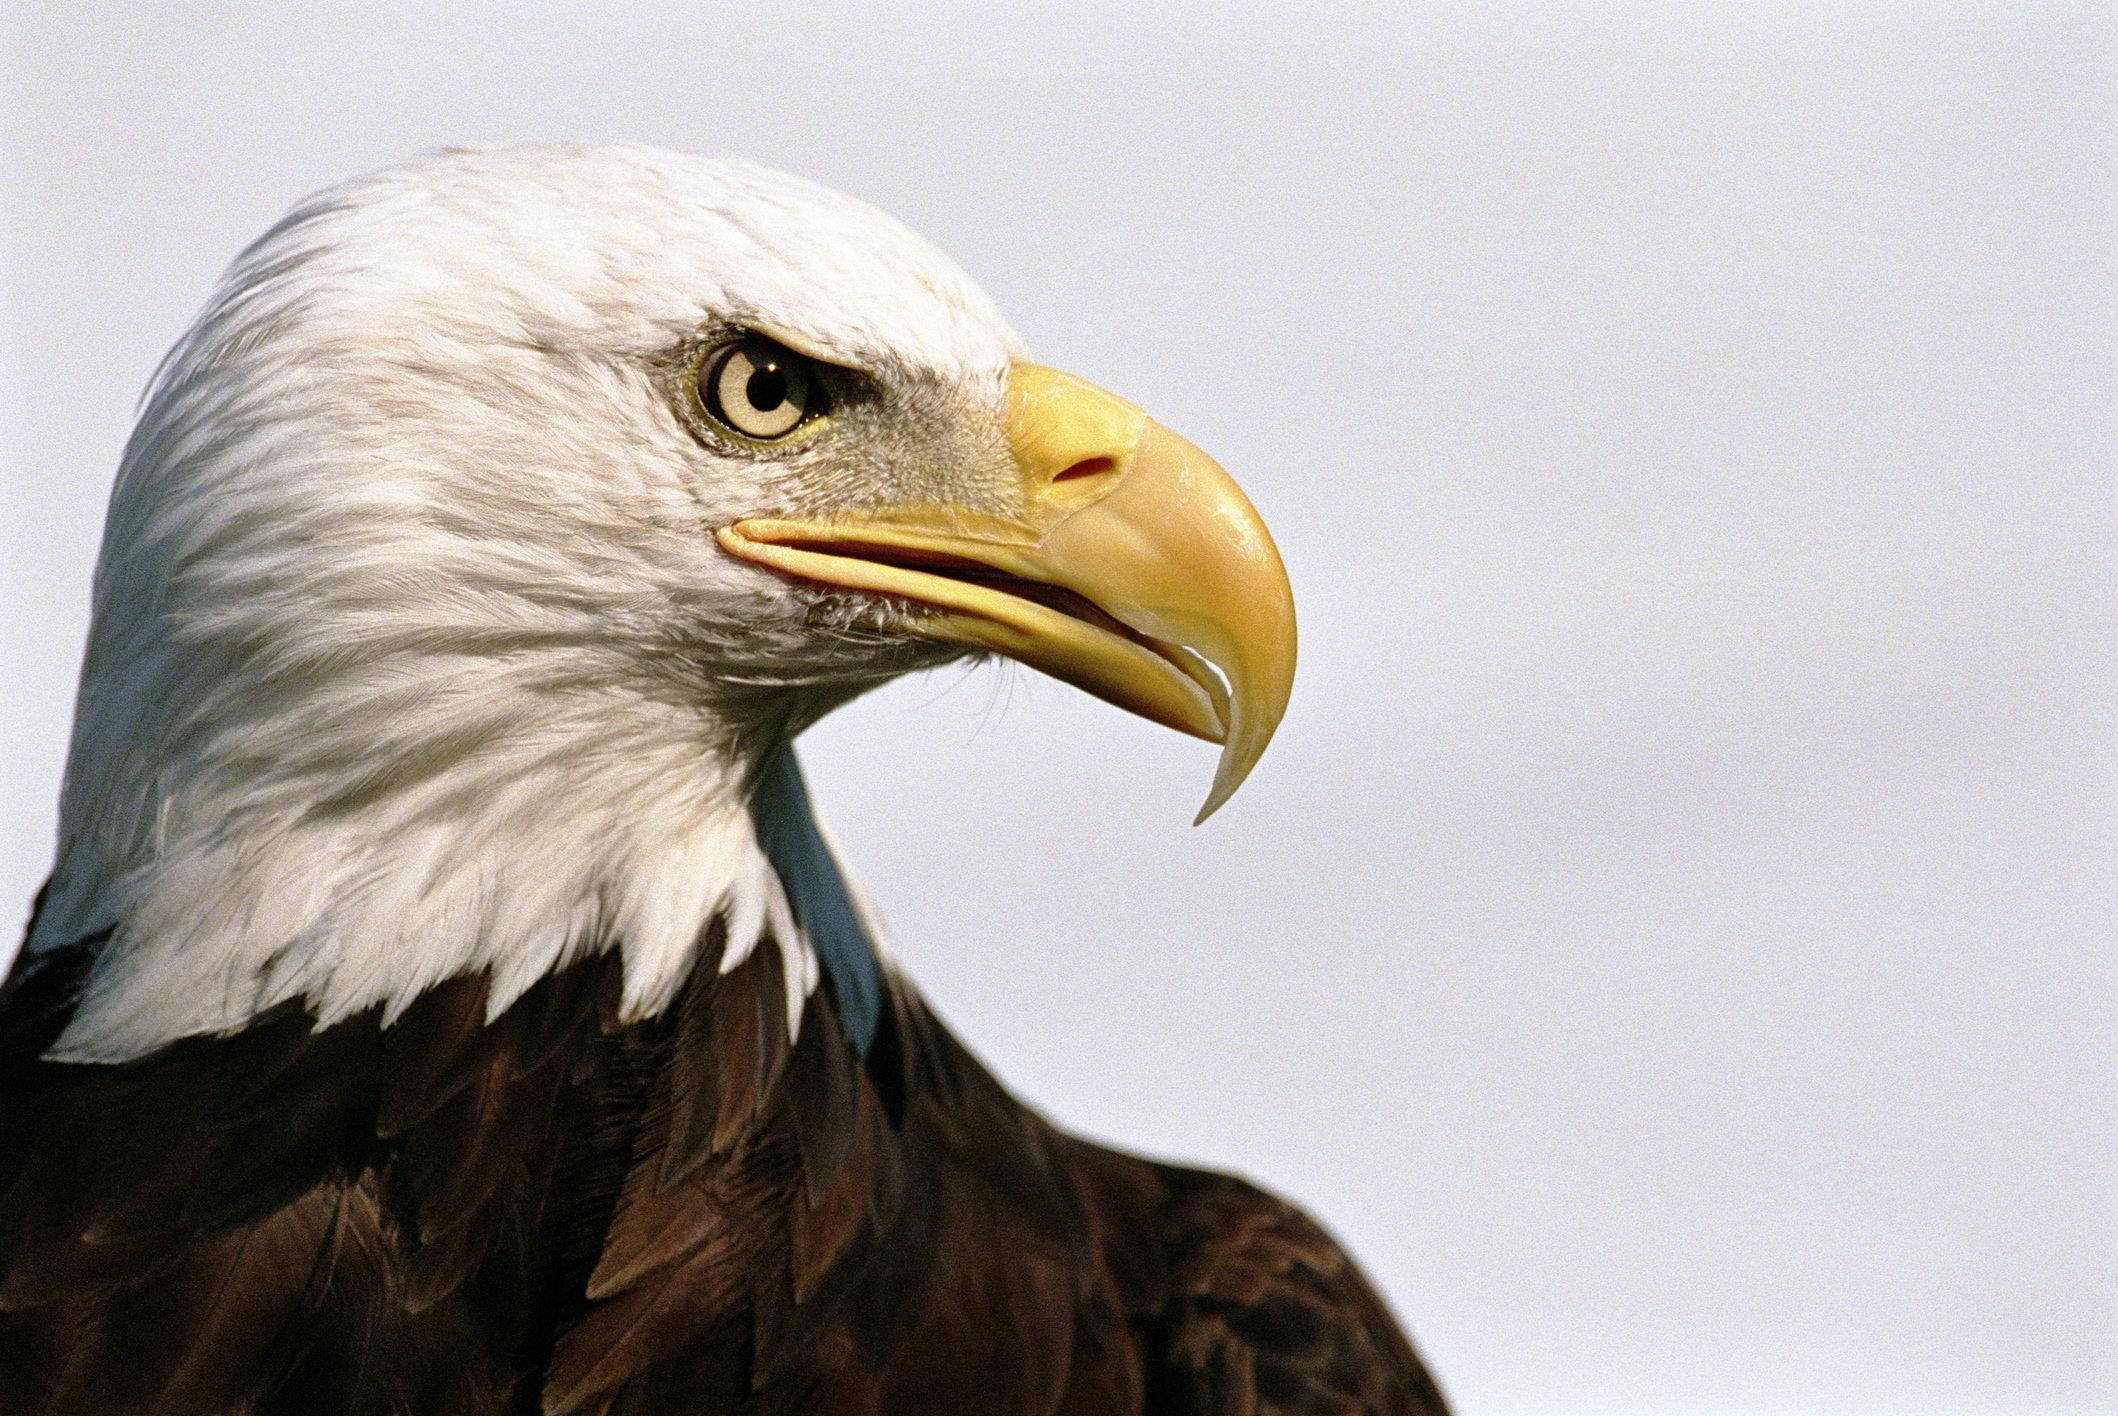 sharp shooting army veteran saves bald eagle stuck up a tree